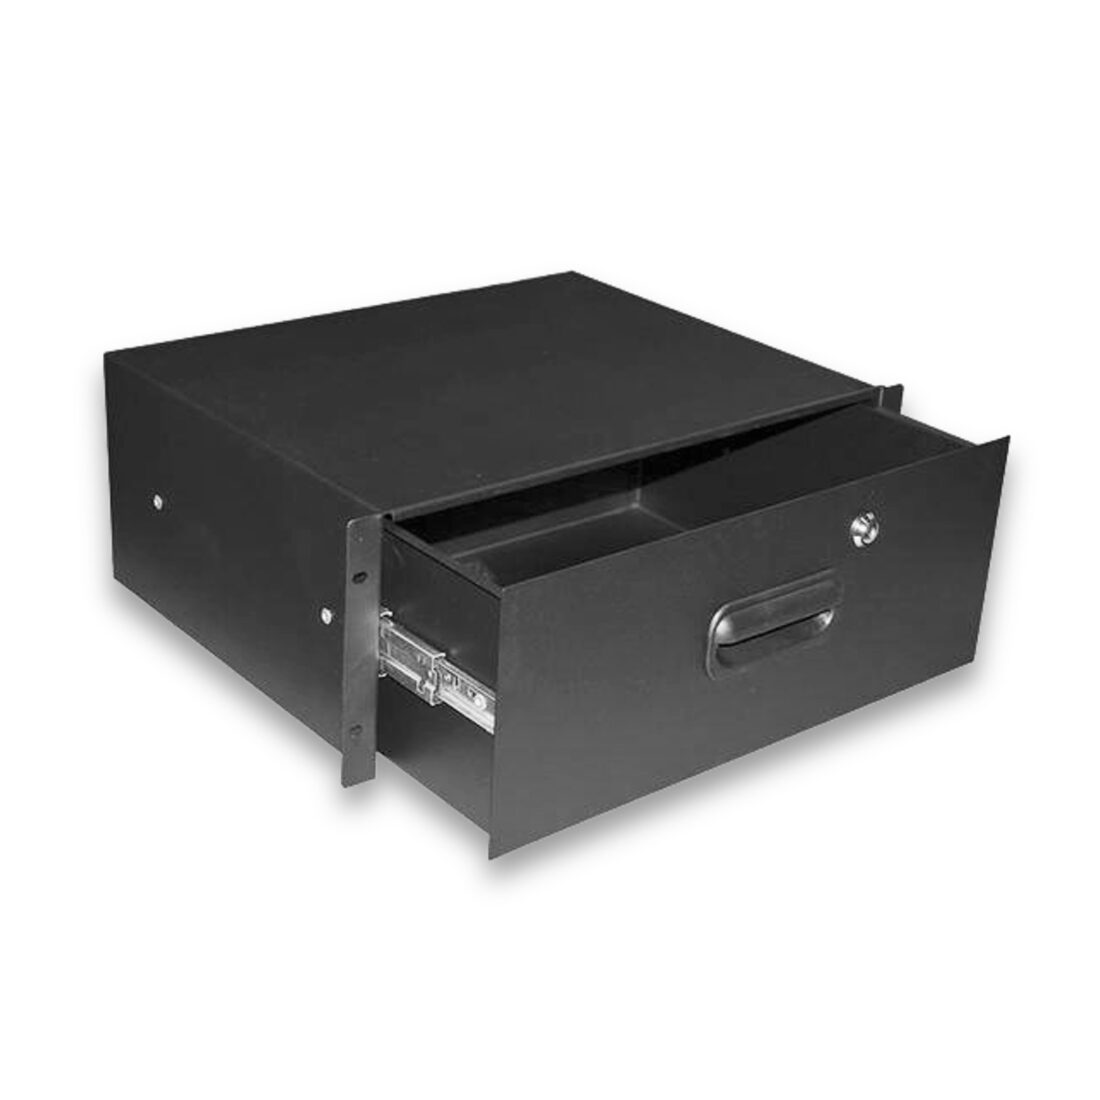 4U rack drawer